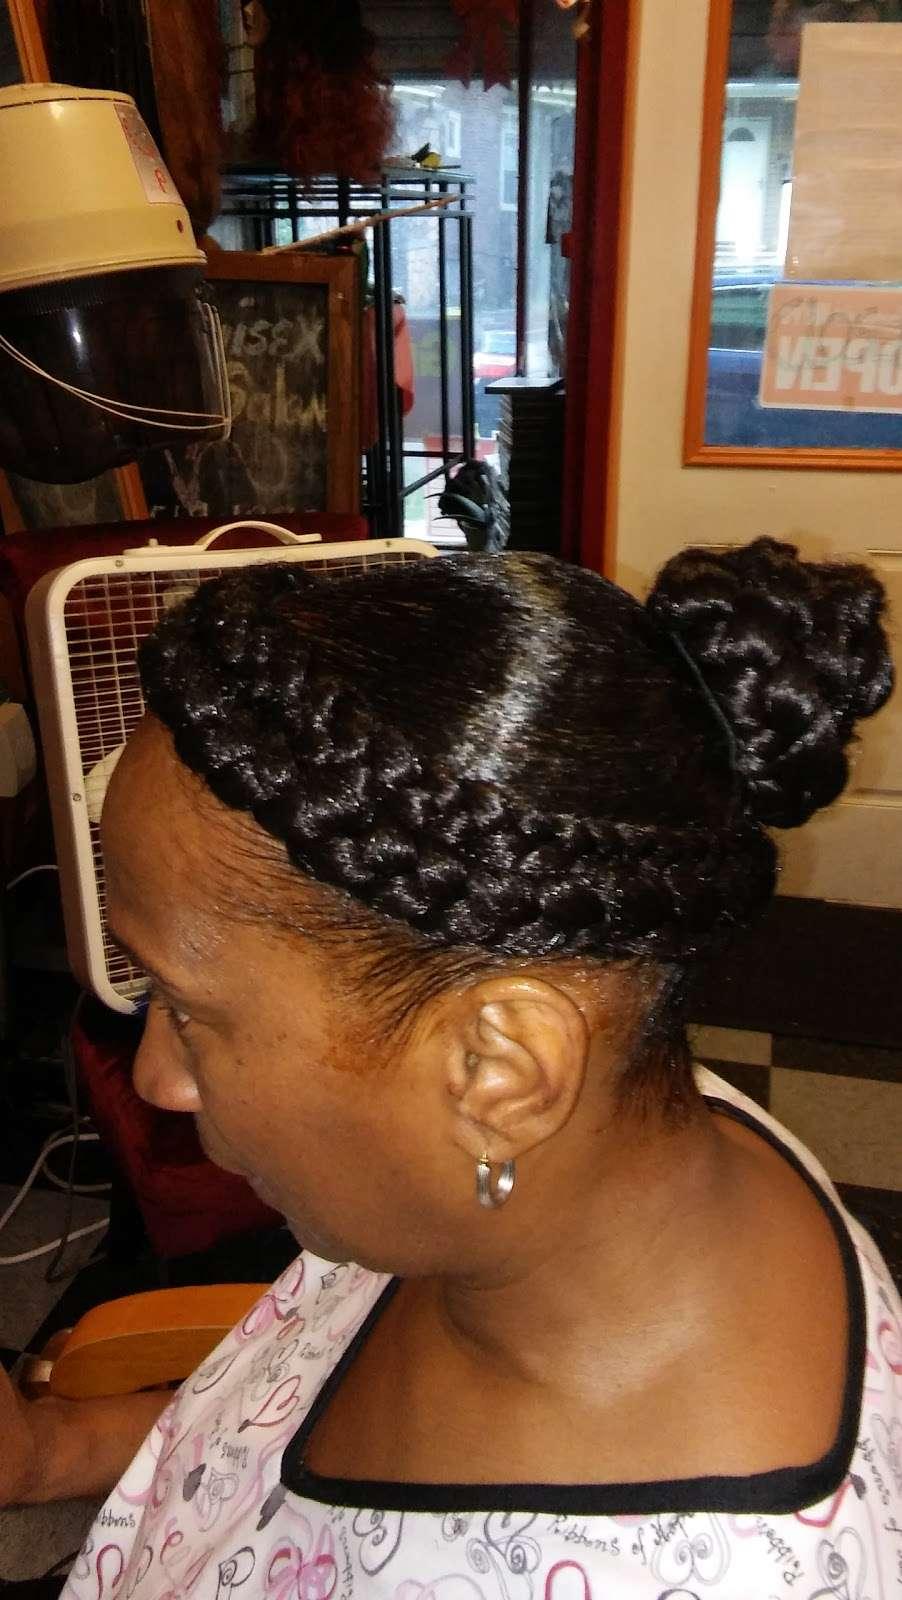 Posh Unisex Beauty Salon - hair care    Photo 9 of 10   Address: Springdale Ave, East Orange, NJ 07017, USA   Phone: (973) 519-1990